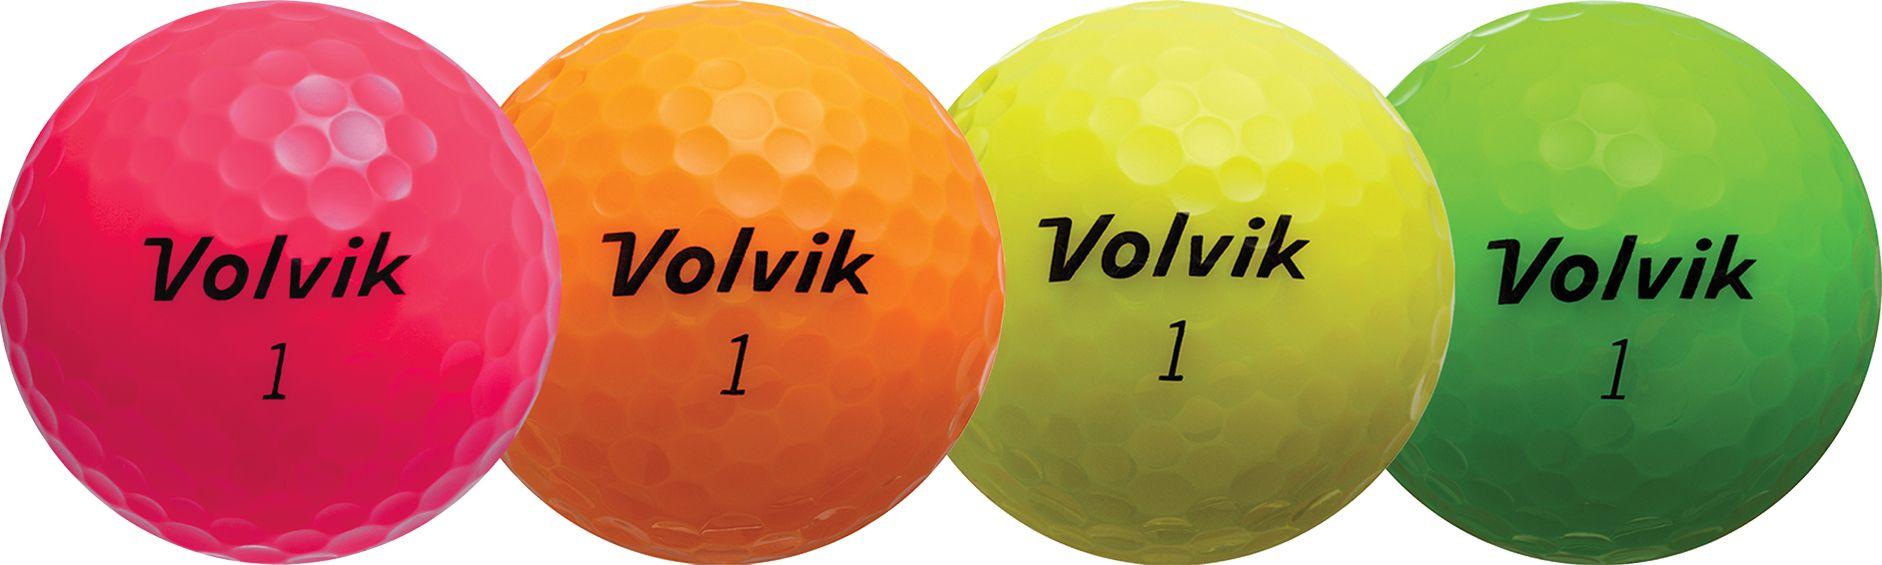 Volvik 2018 Crystal Personalized Golf Balls – Pink/Orange/Yellow/Green, Black